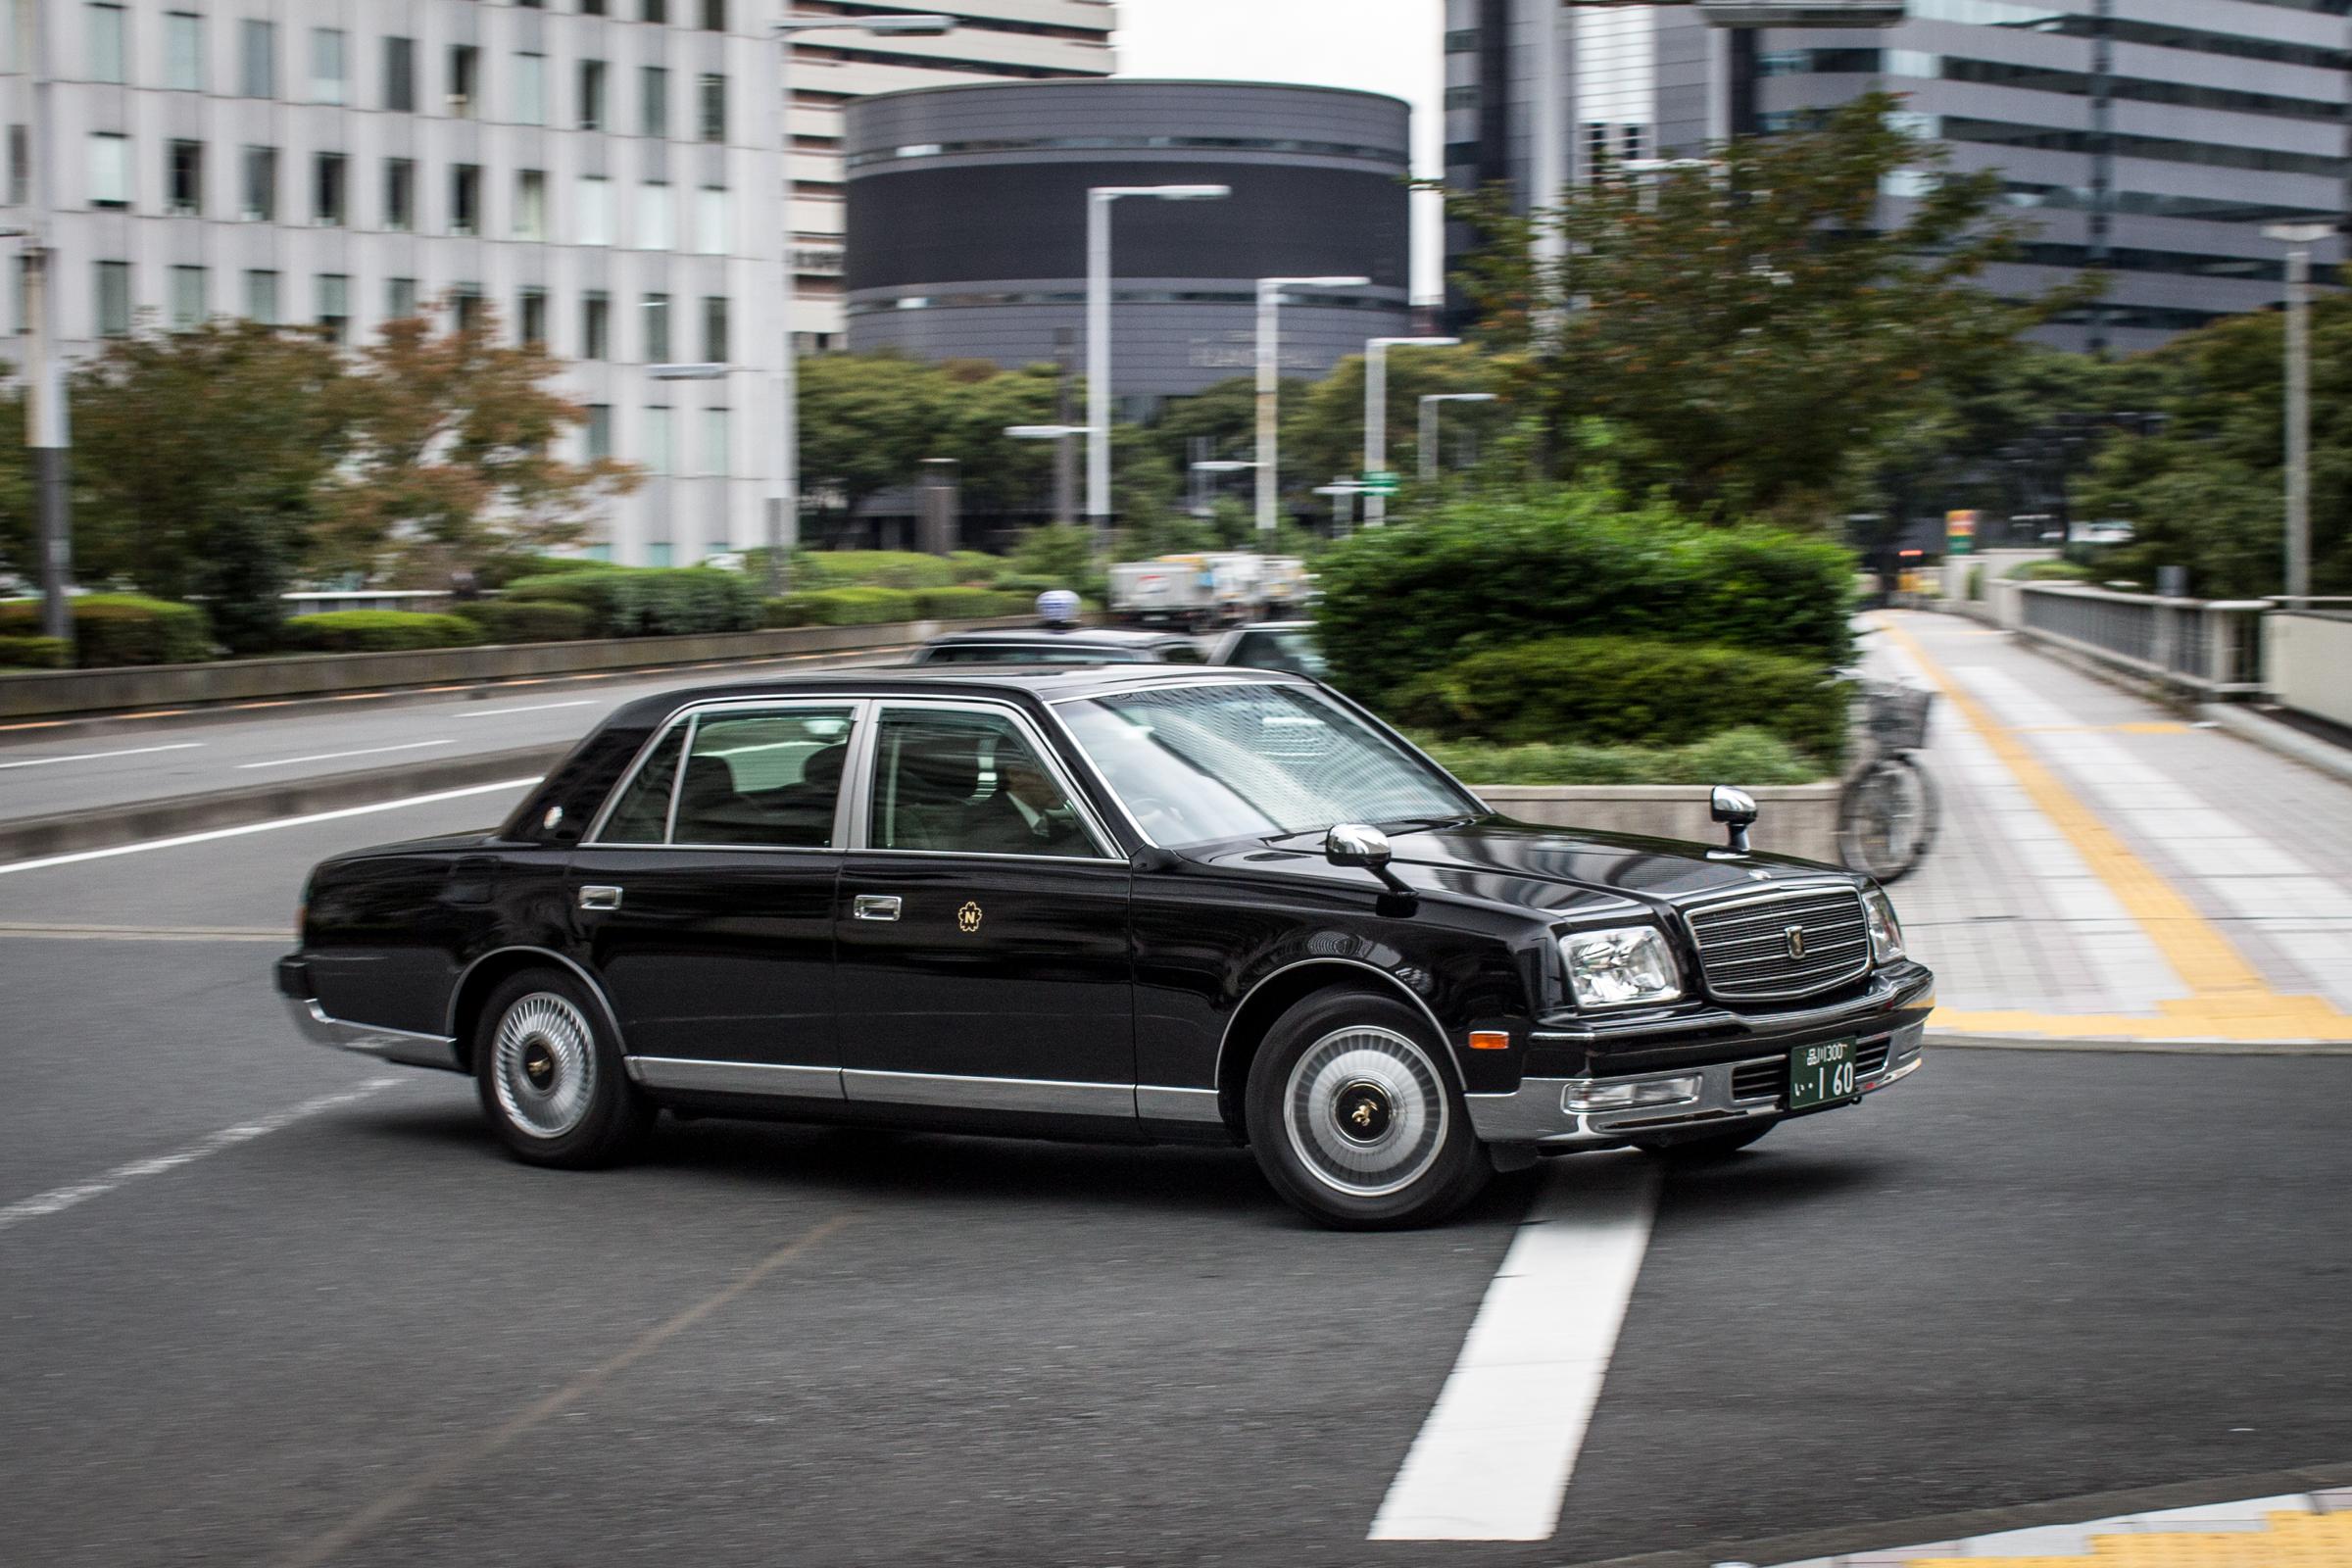 Toyota Century driving